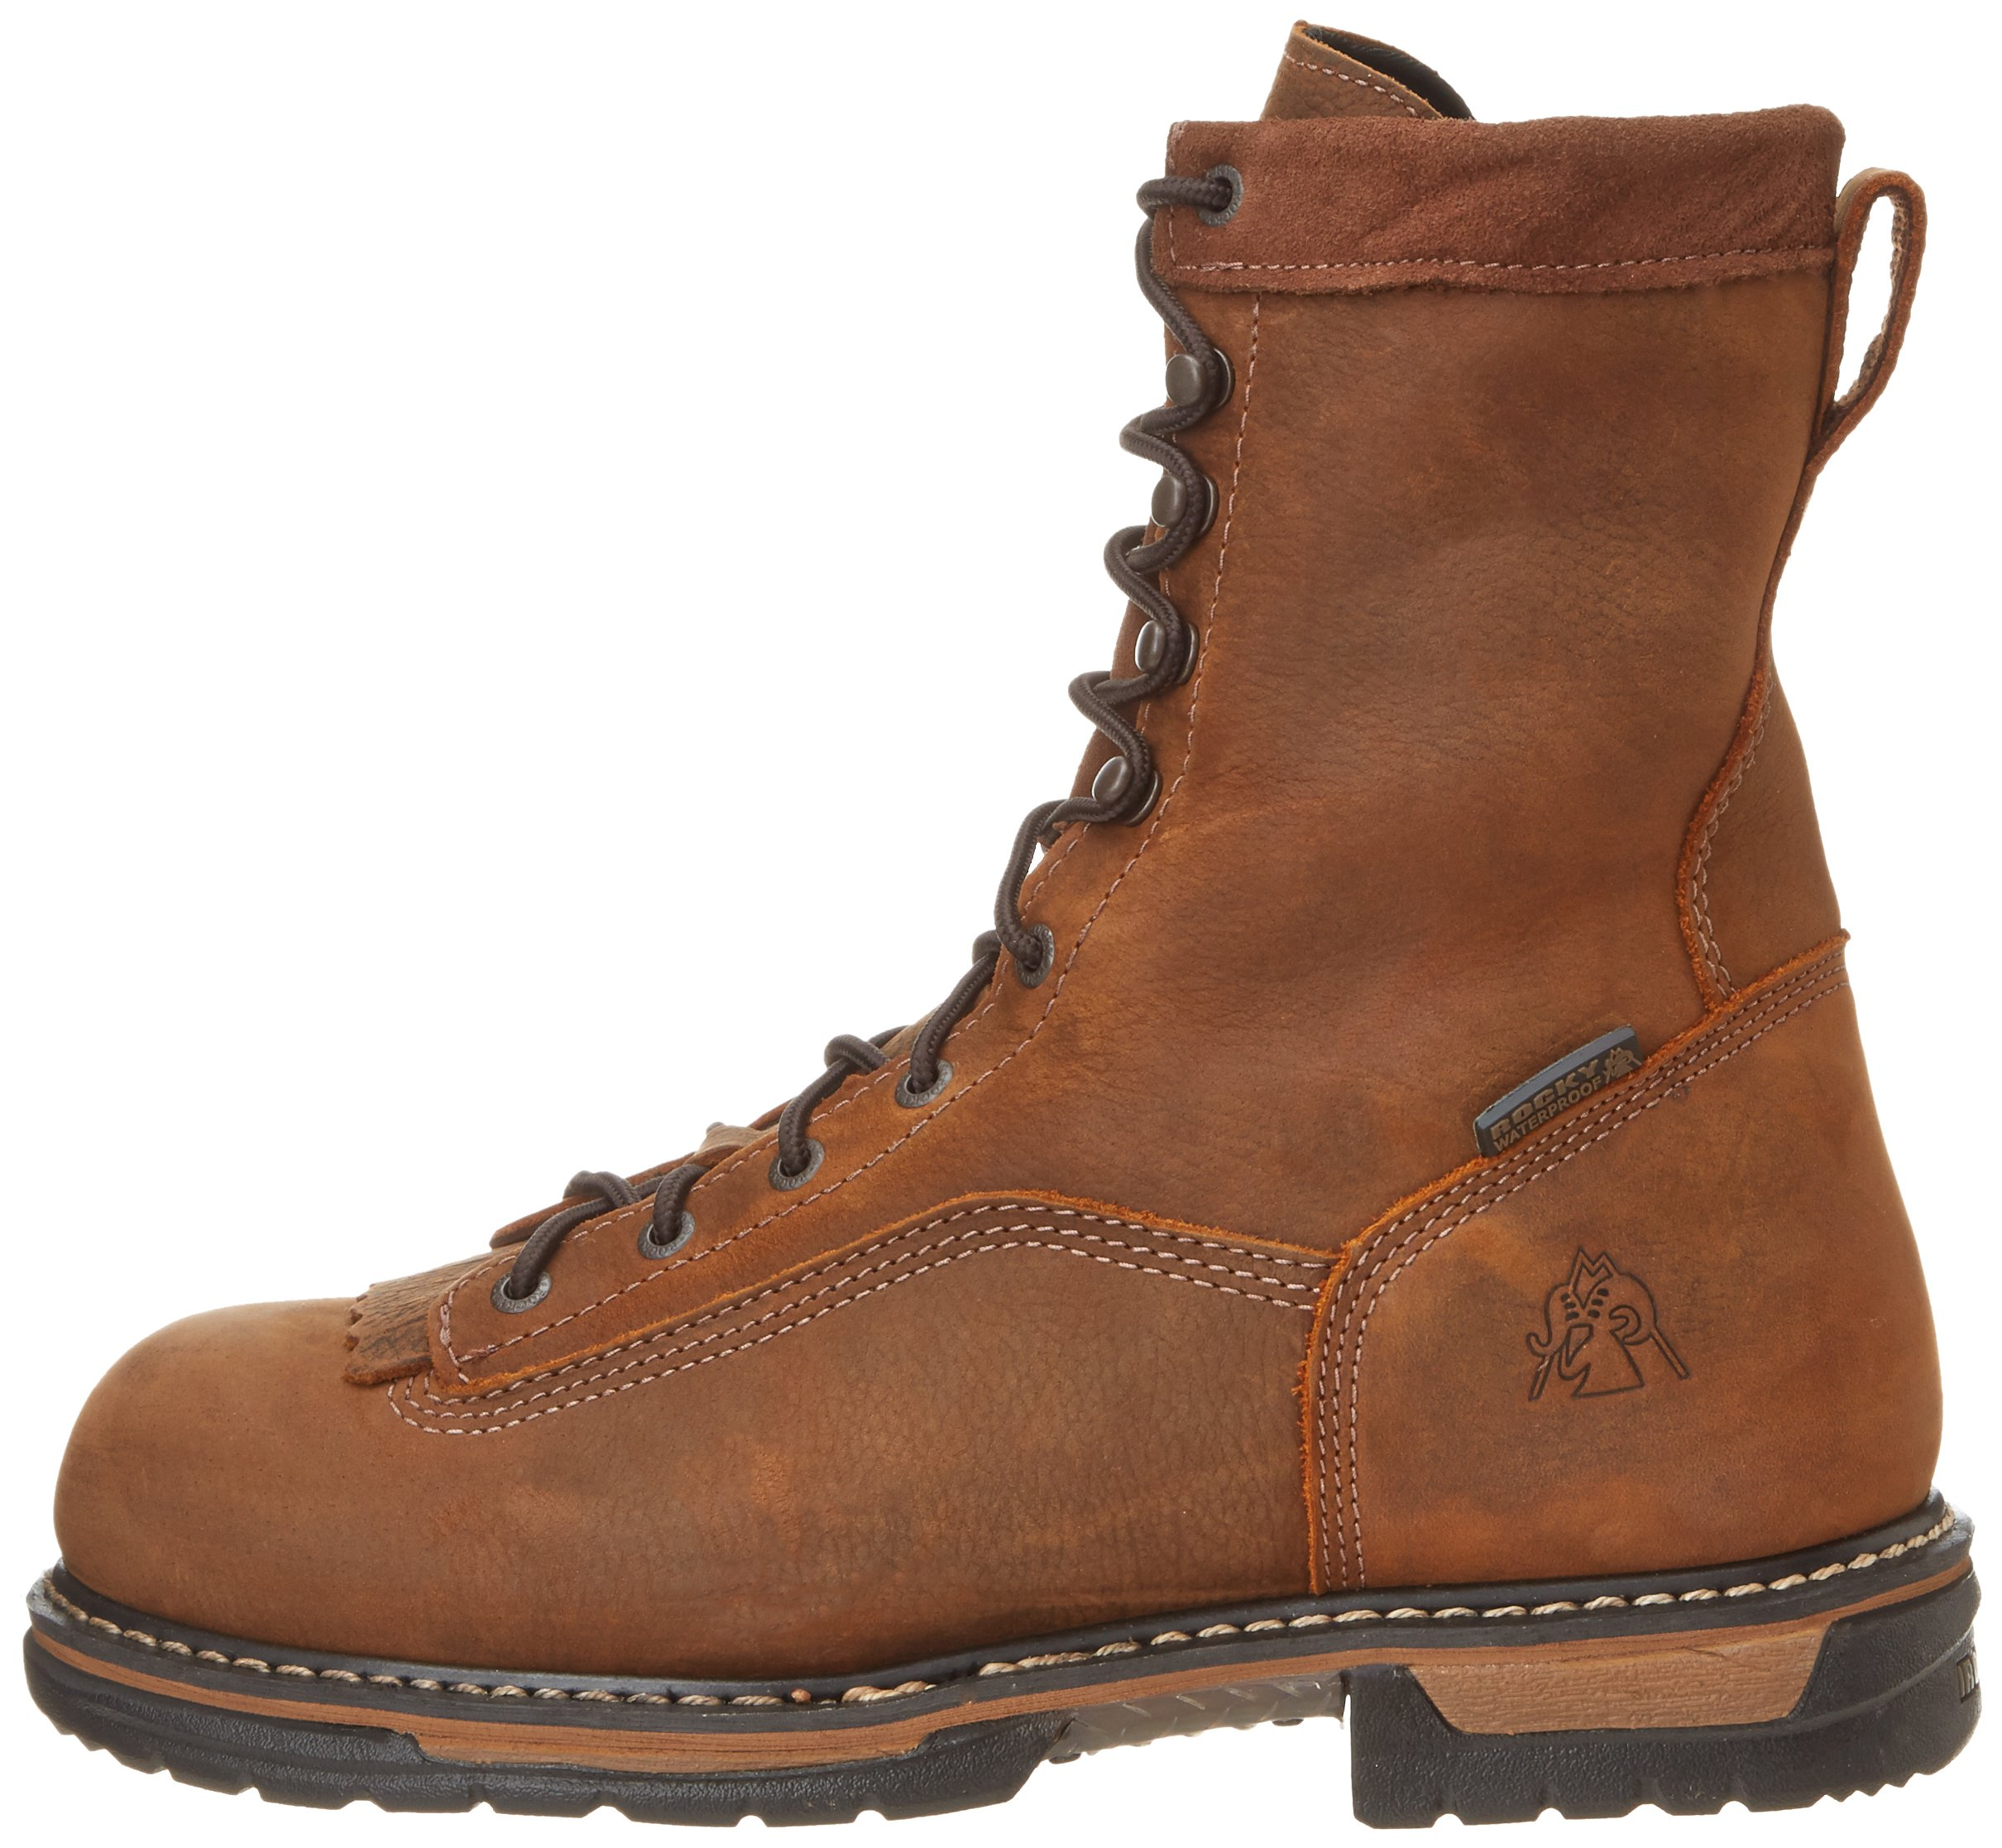 Rocky Men's Iron Clad Eight Inch LTT Steel Toe Work Boot,Brown,13 M US by Rocky (Image #5)